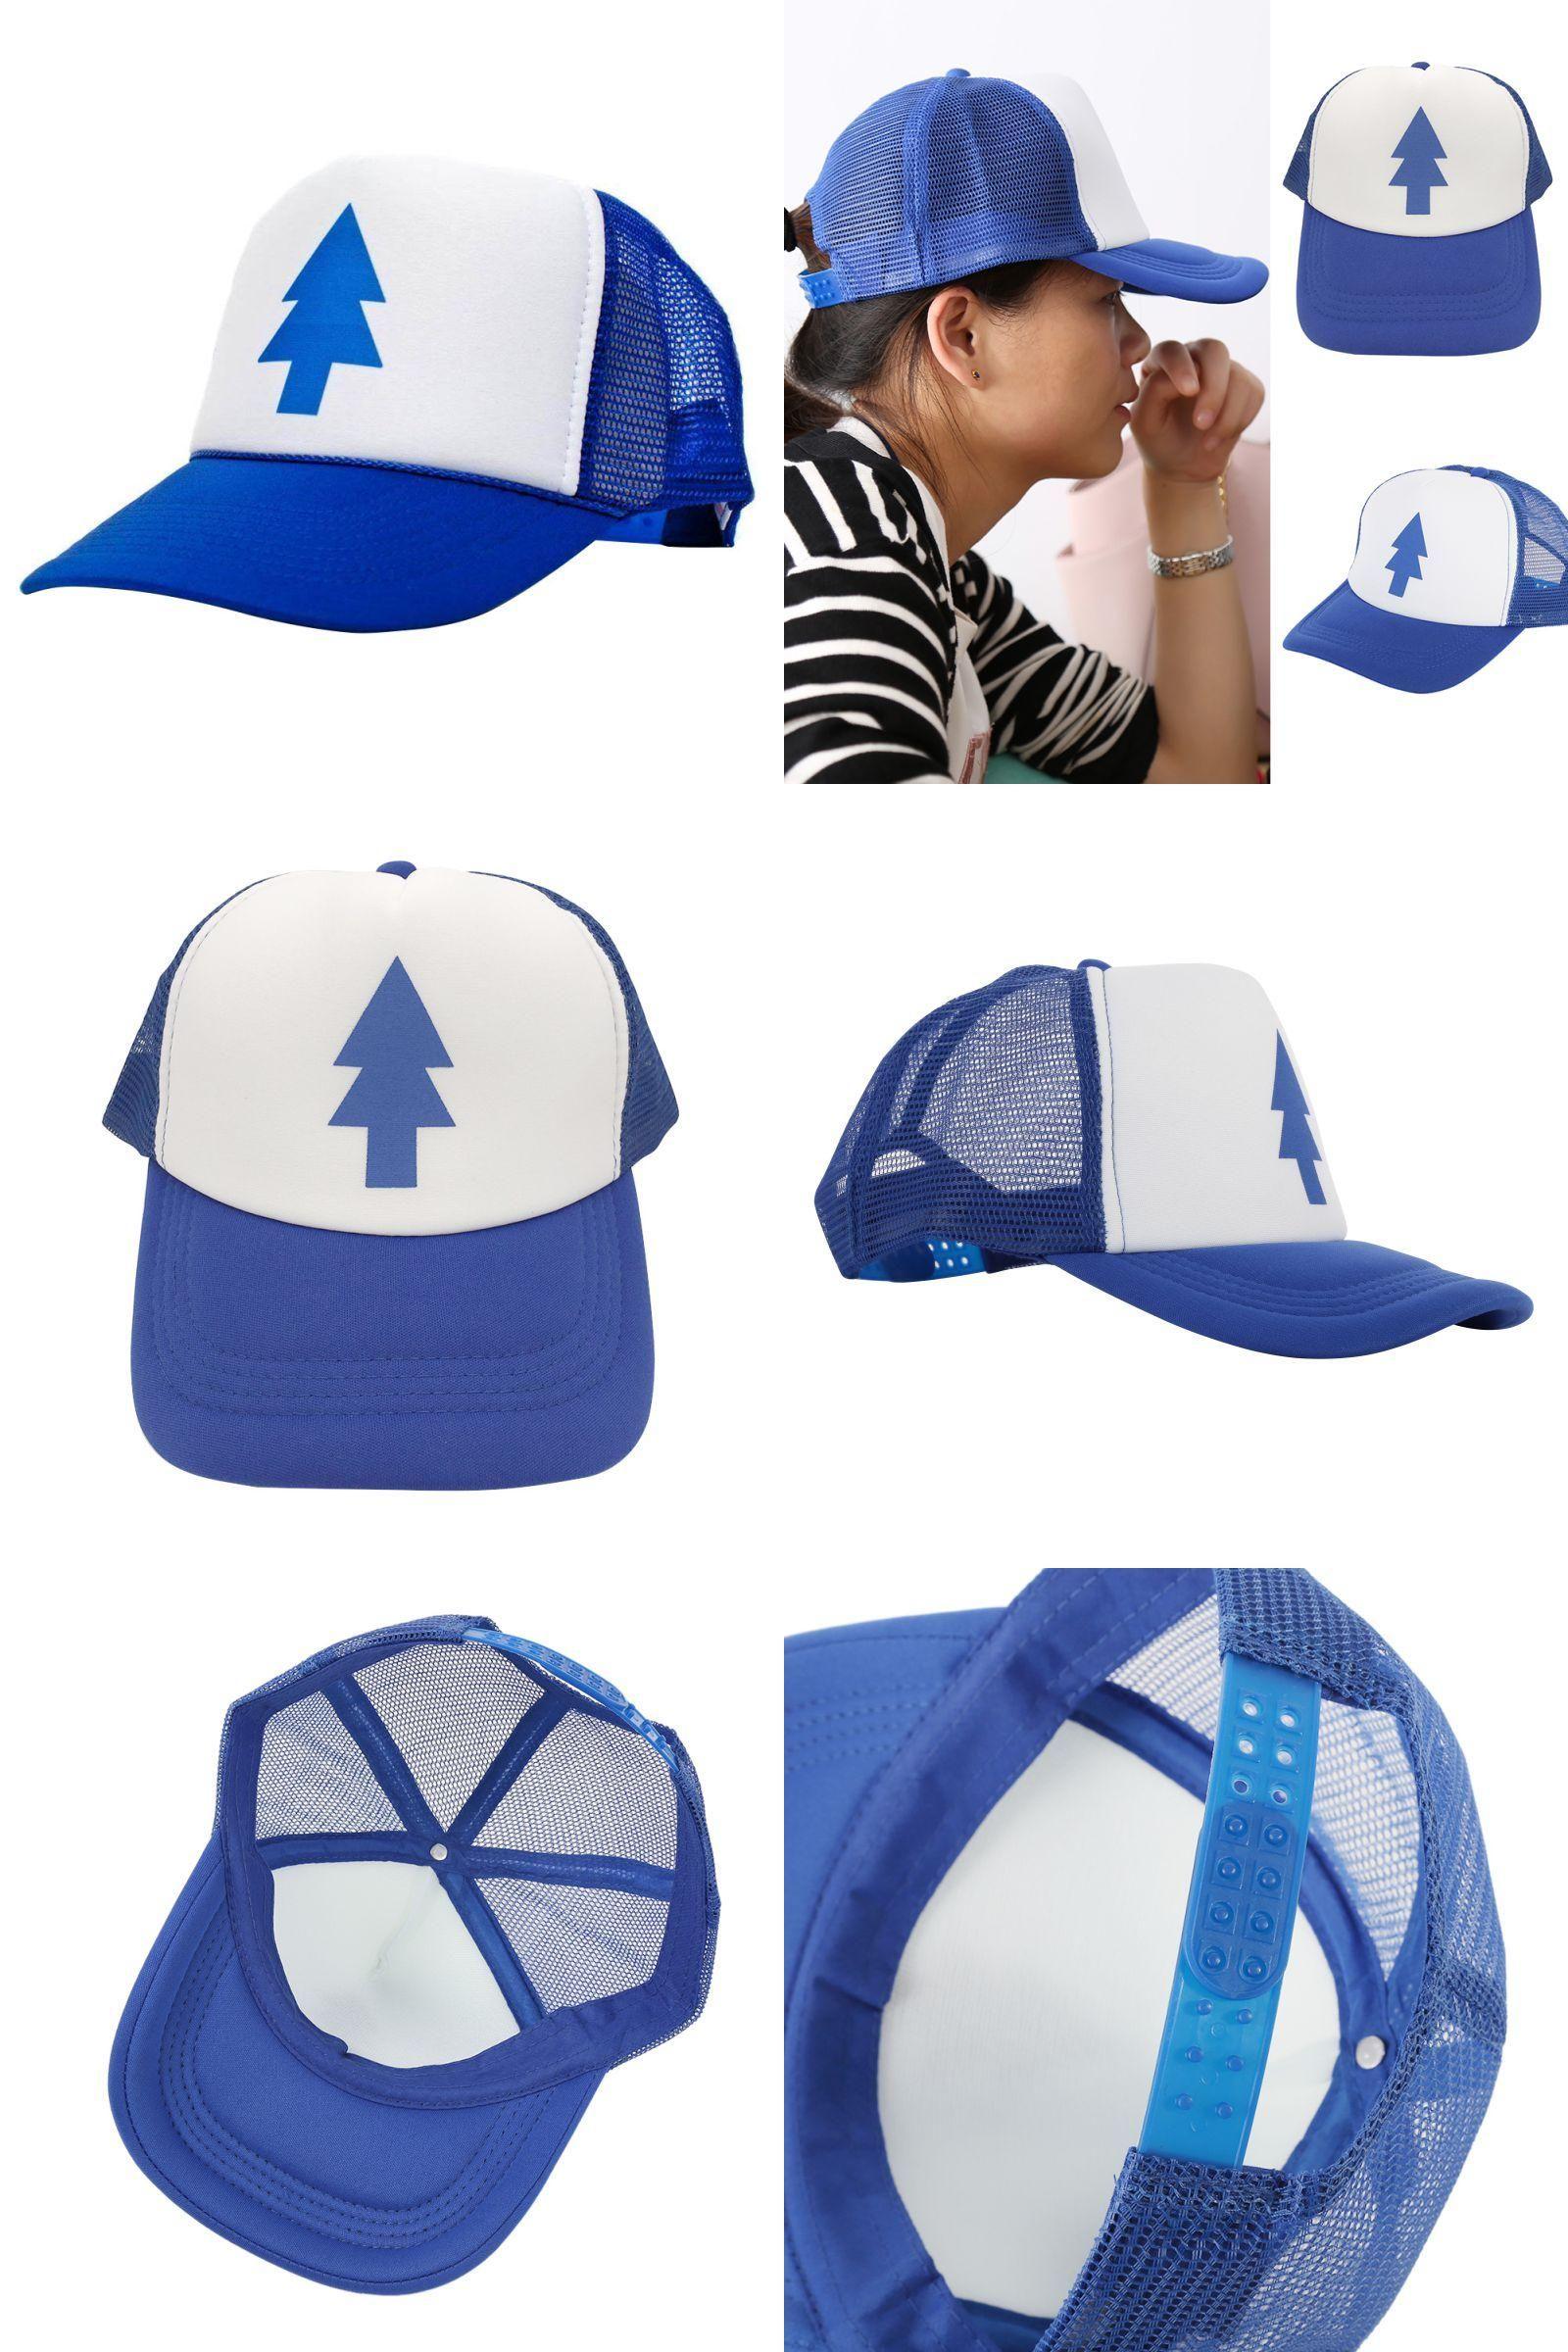 705540affdac4  Visit to Buy  Unisex Trucker Baseball hat Women Men Curved Bill BLUE PINE  TREE Dipper Gravity Falls Cartoon Mesh Hat Cap S1  Advertisement